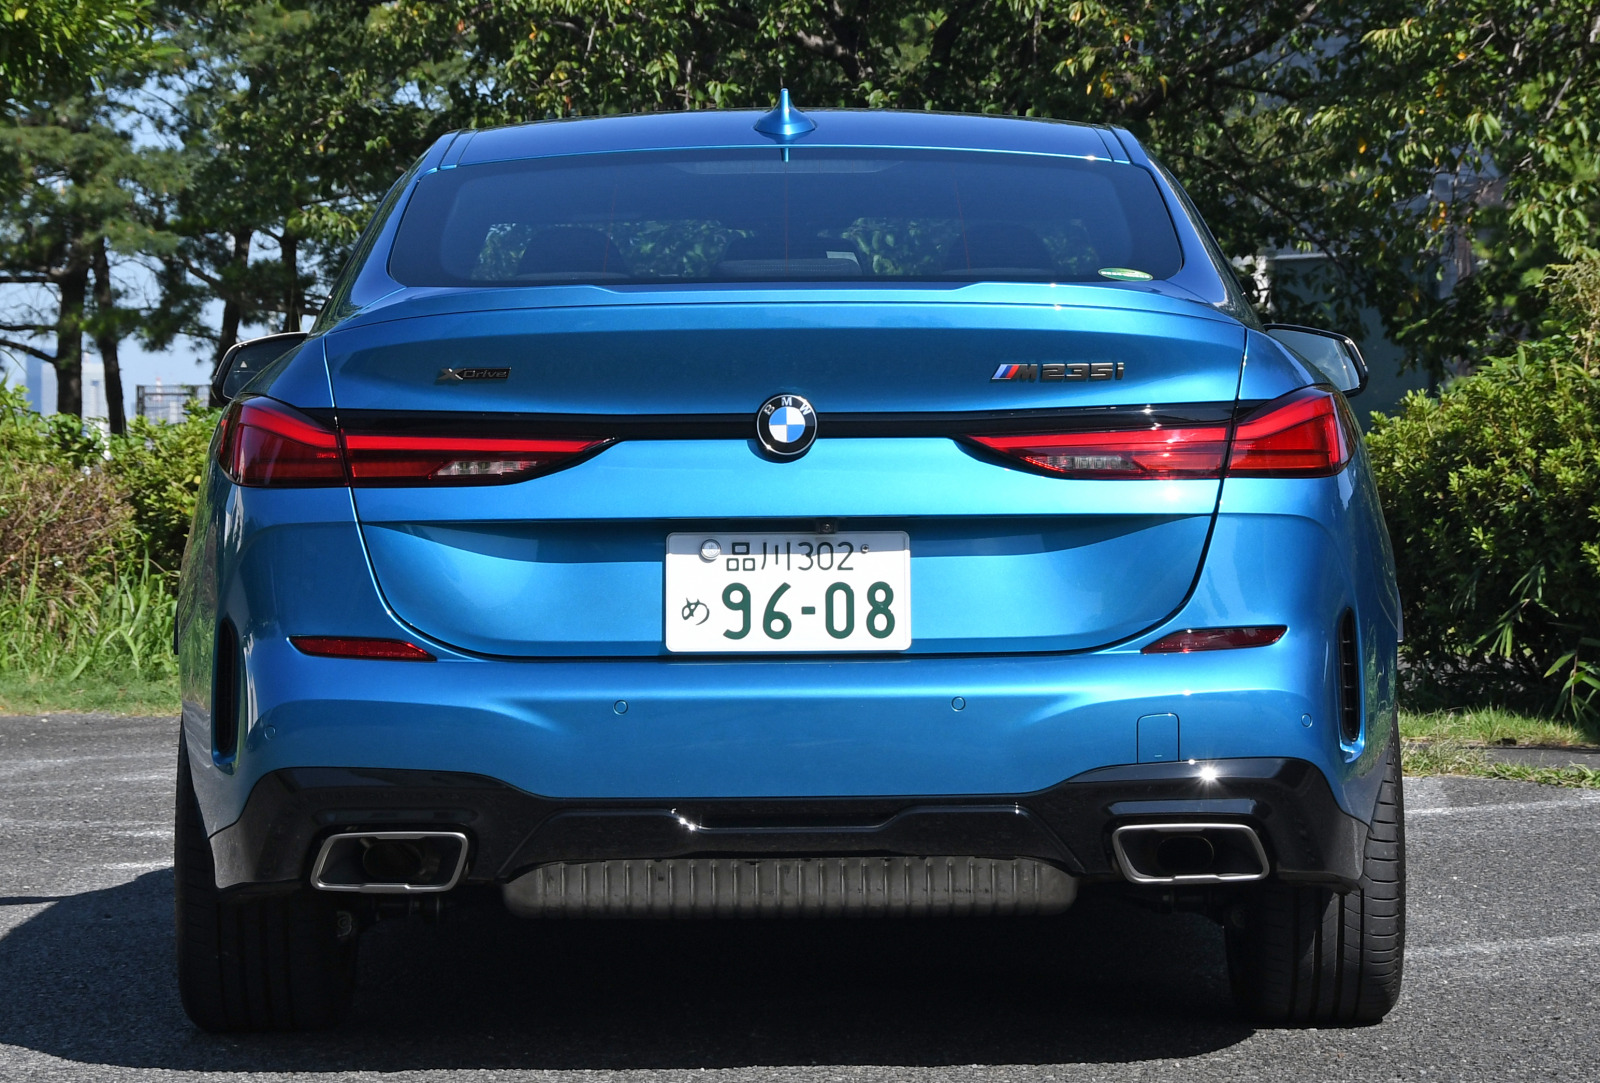 「FFベース4WDの味付けに開眼したBMW 【BMW M235i Xドライブ グランクーペ試乗】」の9枚目の画像